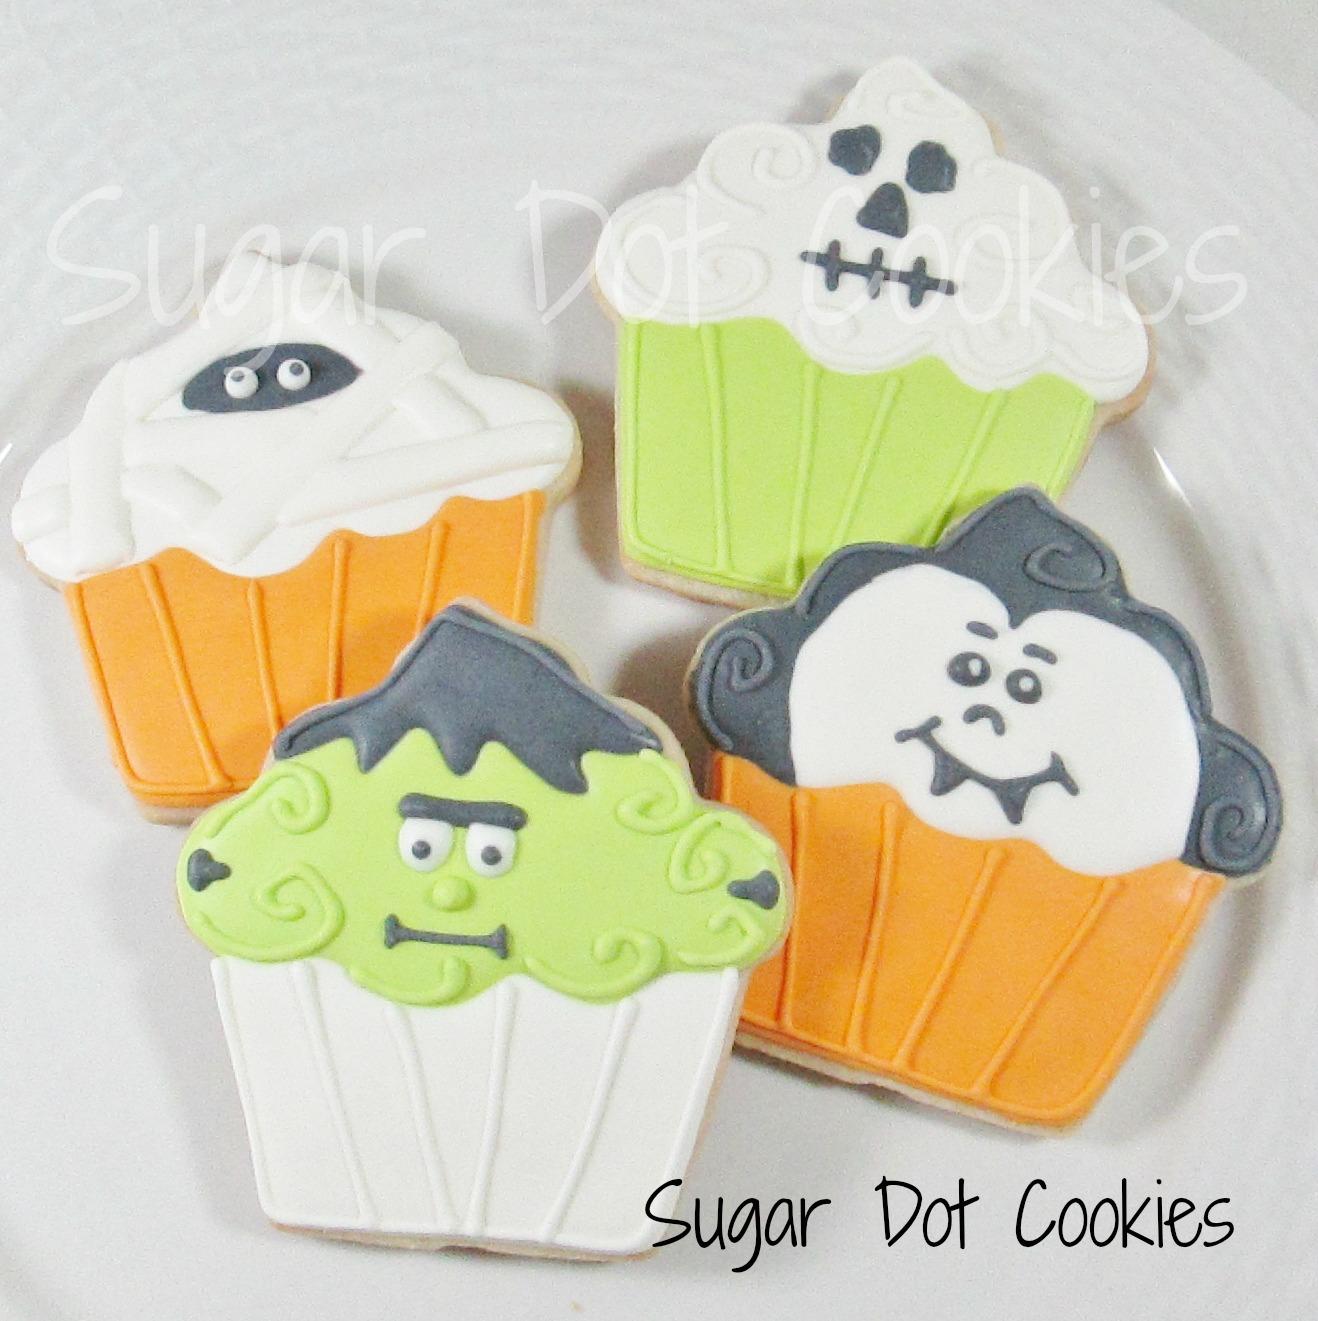 halloween sugar cookie ideas sugar dot cookies halloween sugar cookies with royal icing